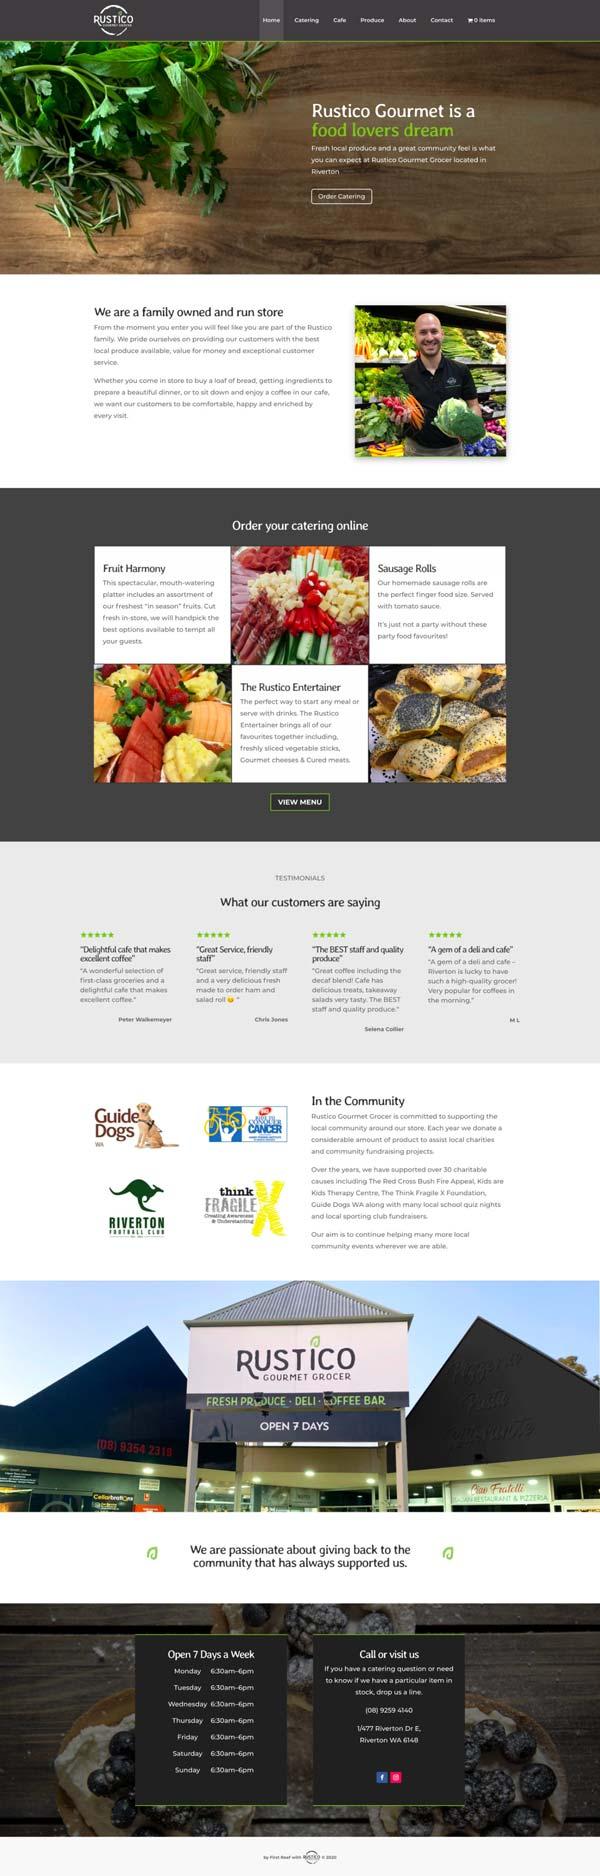 Full page screenshot of Rustico Gourmet